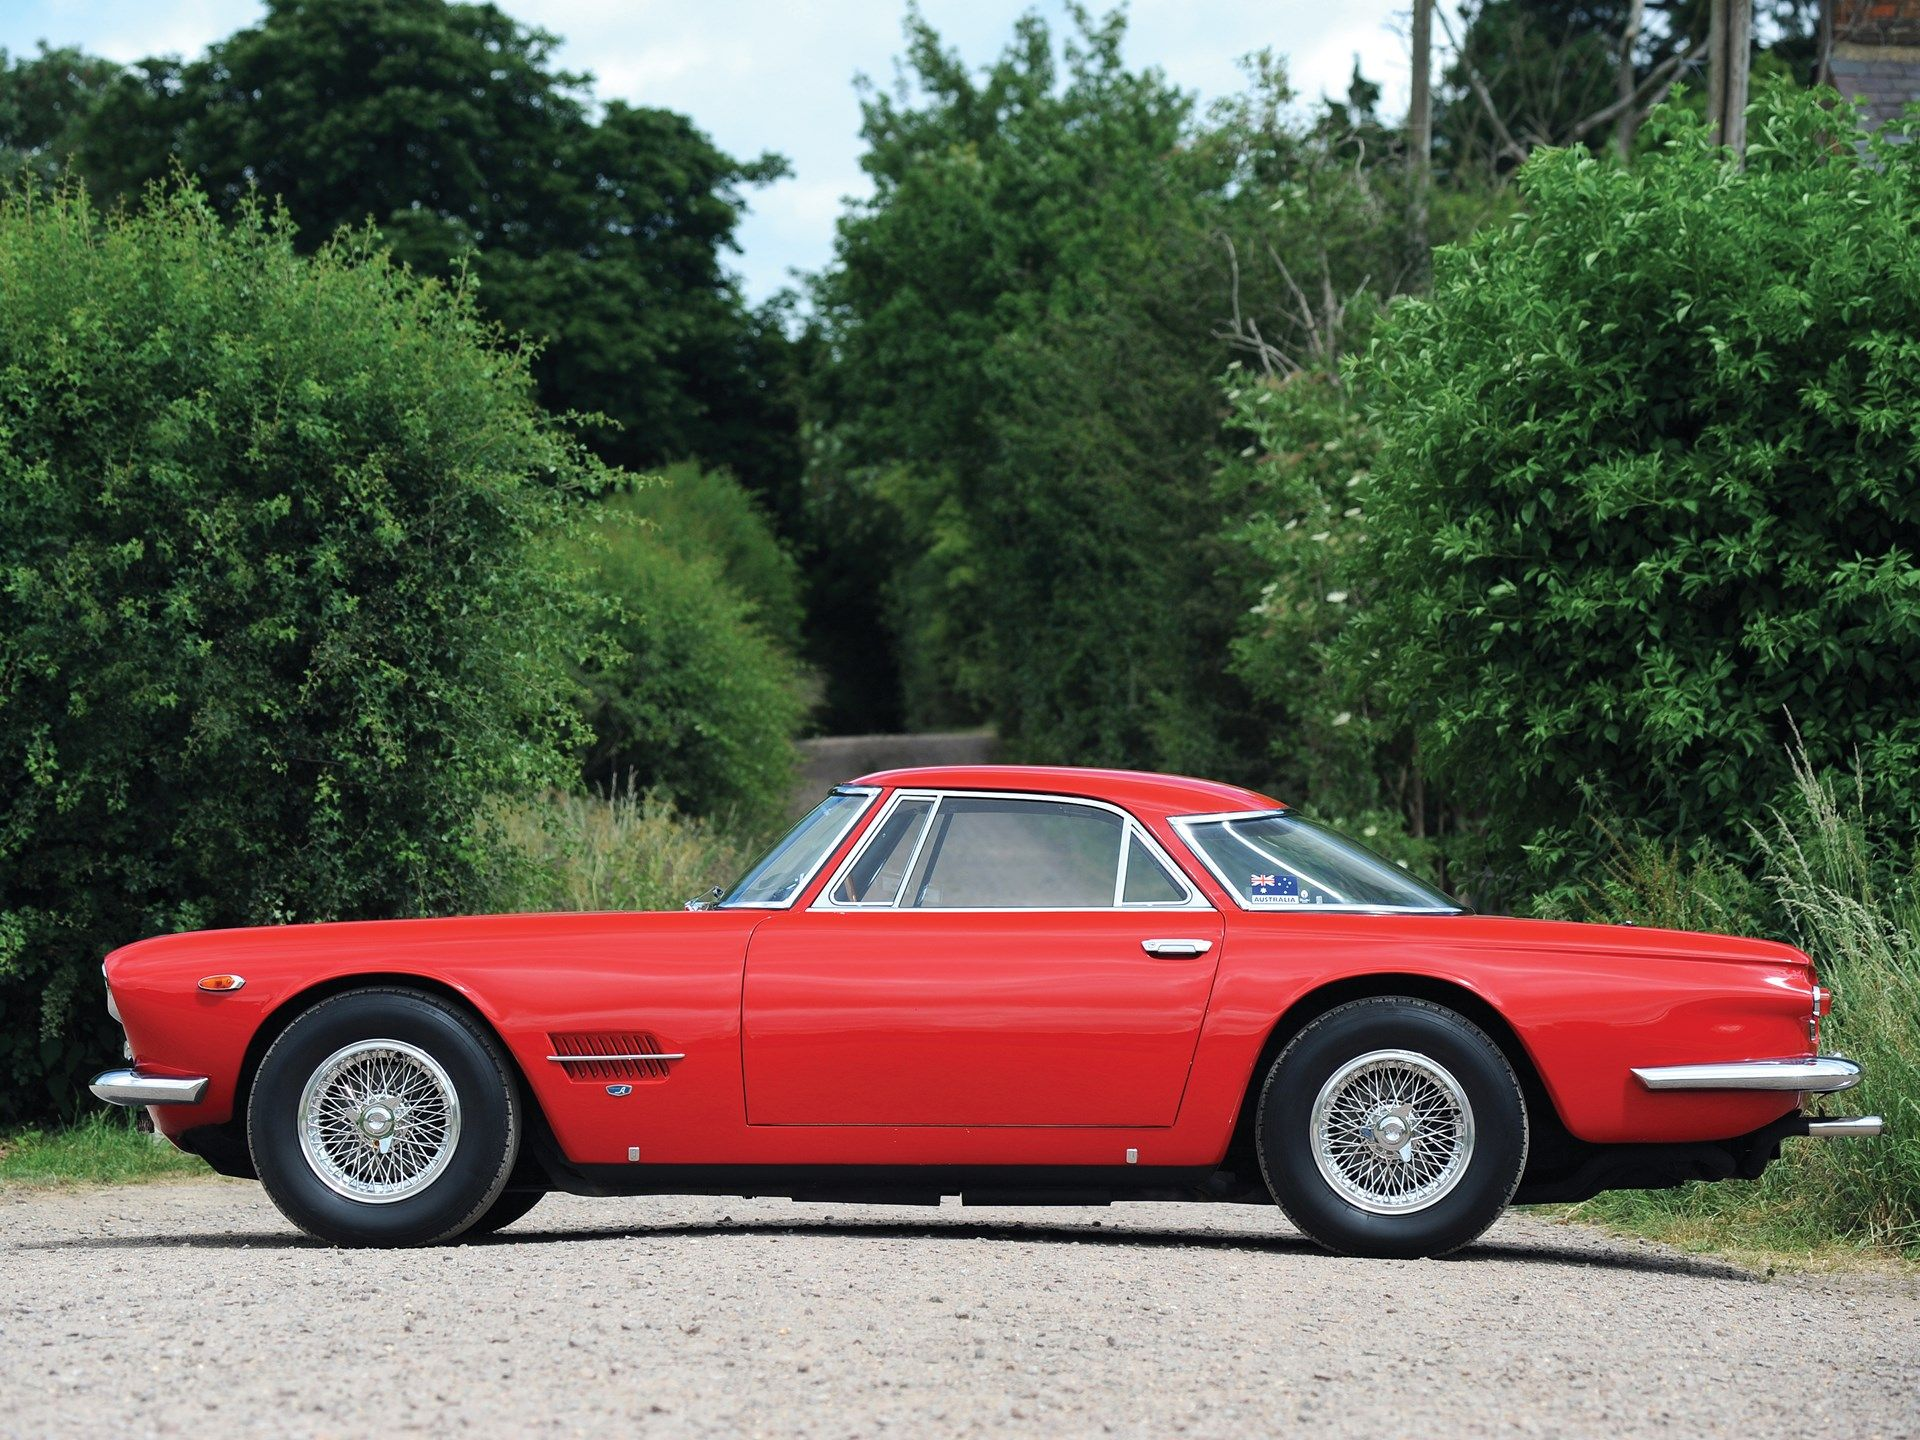 1962 Maserati 5000 Gt By Allemano Maserati Vintage Sports Cars